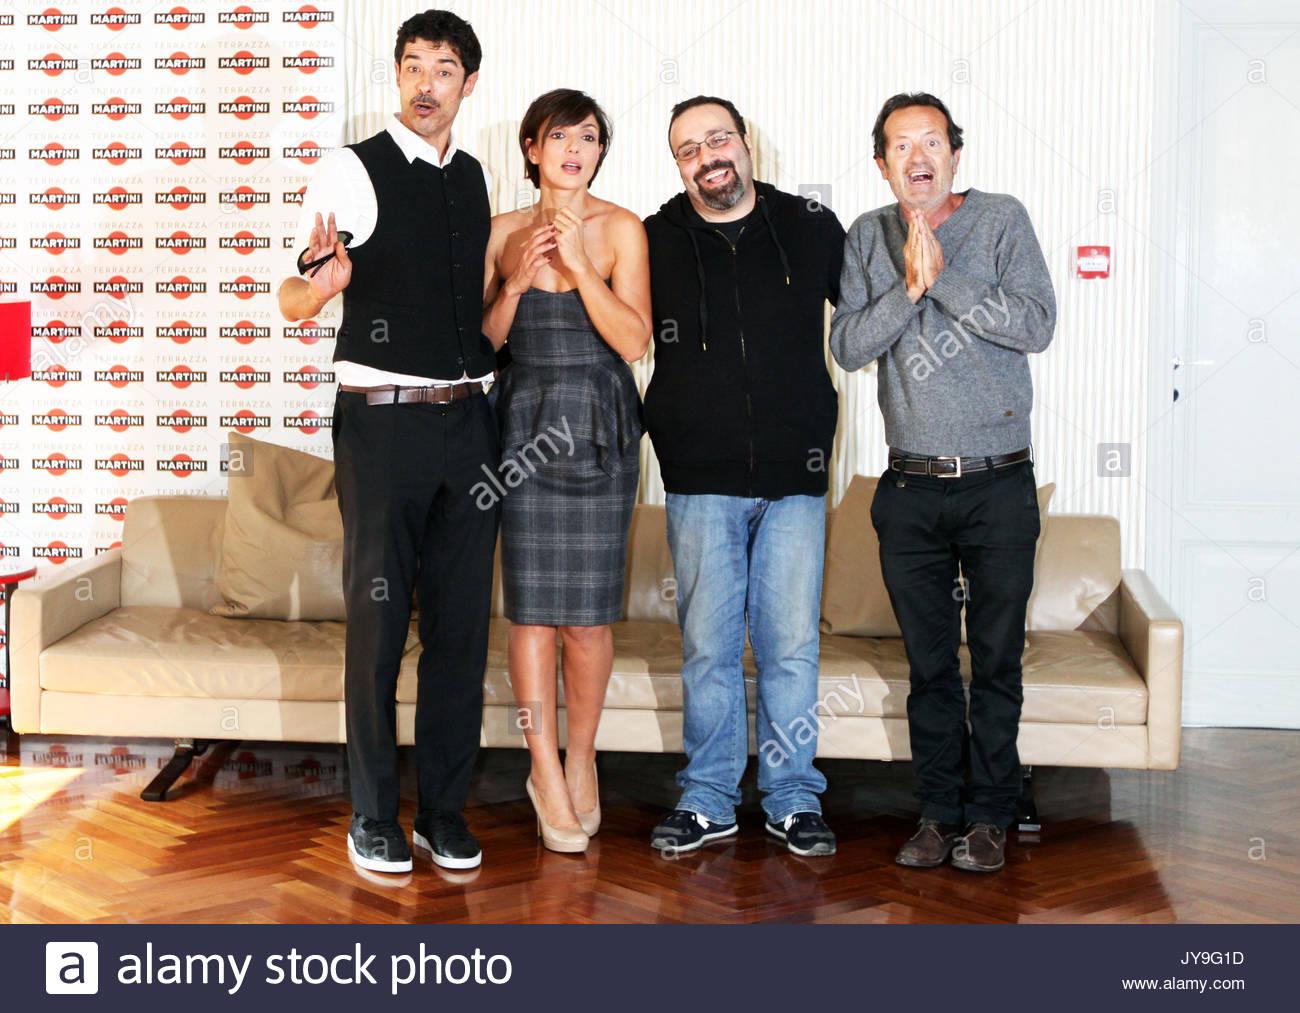 Ambra Angiolinis Rocco Papaleo, Alessandro Gasmann und Massimiliano ...